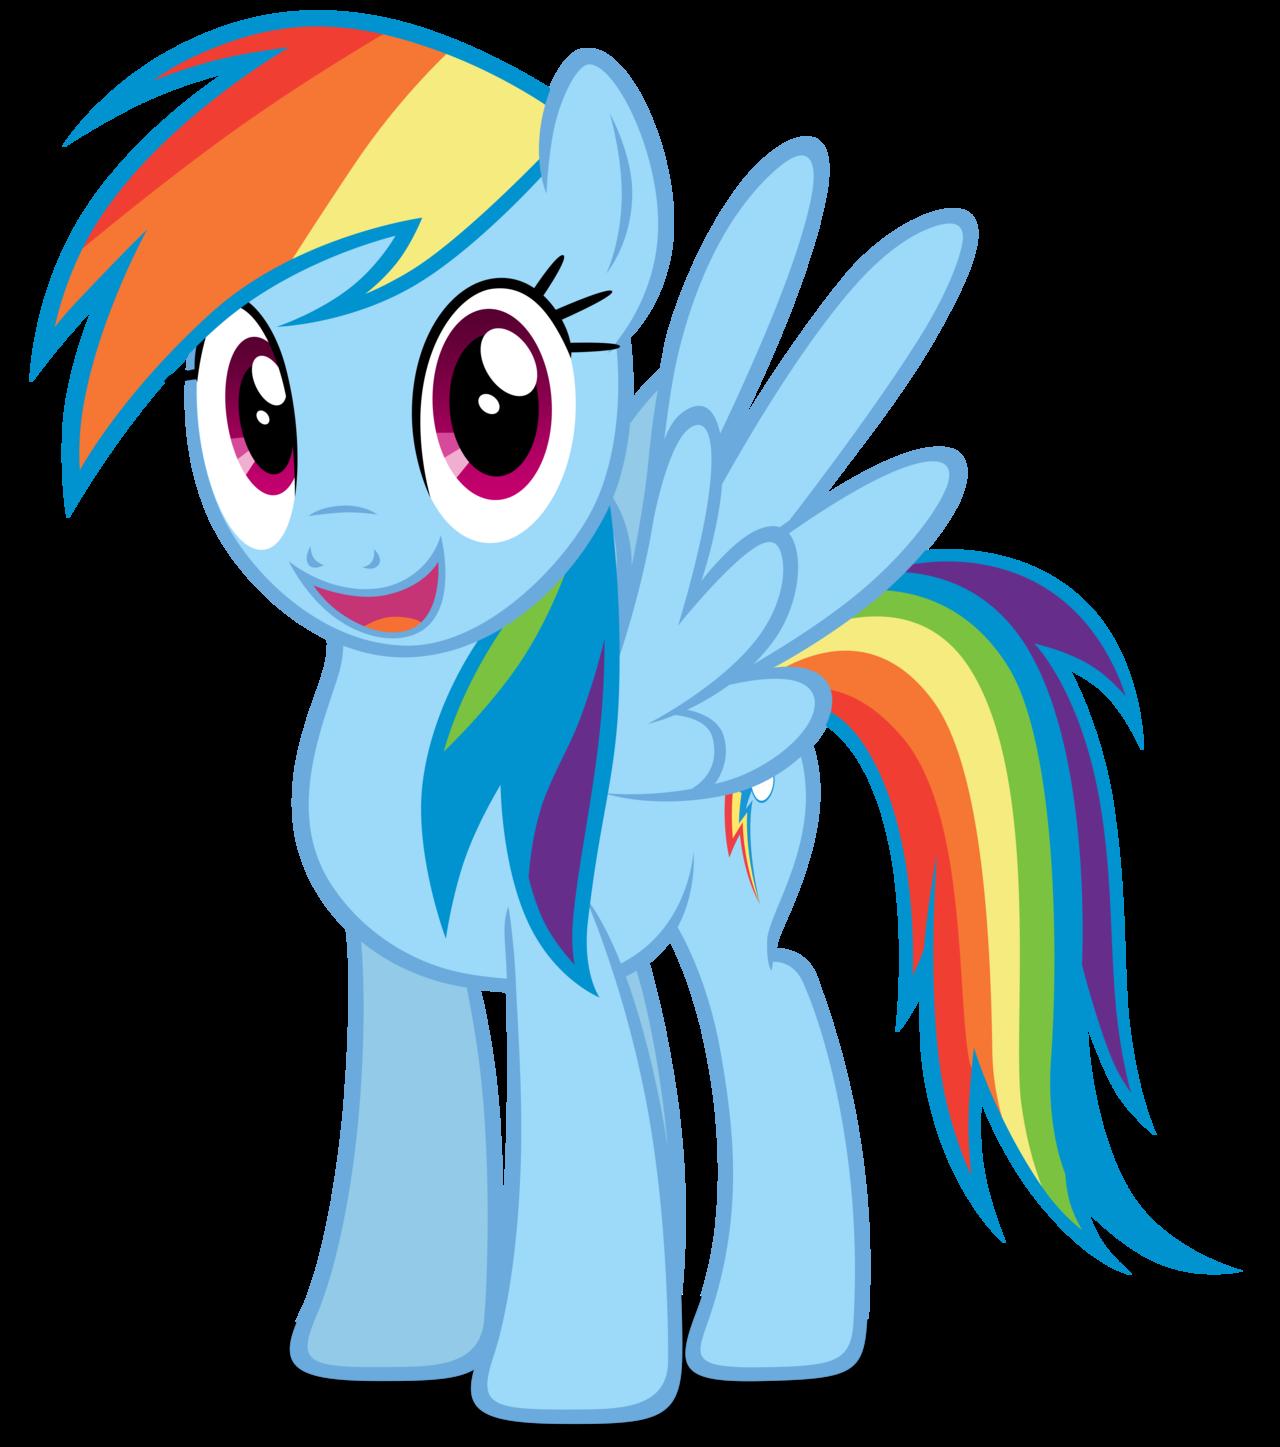 Clipart rainbow pony. Dash pinterest rainbows and